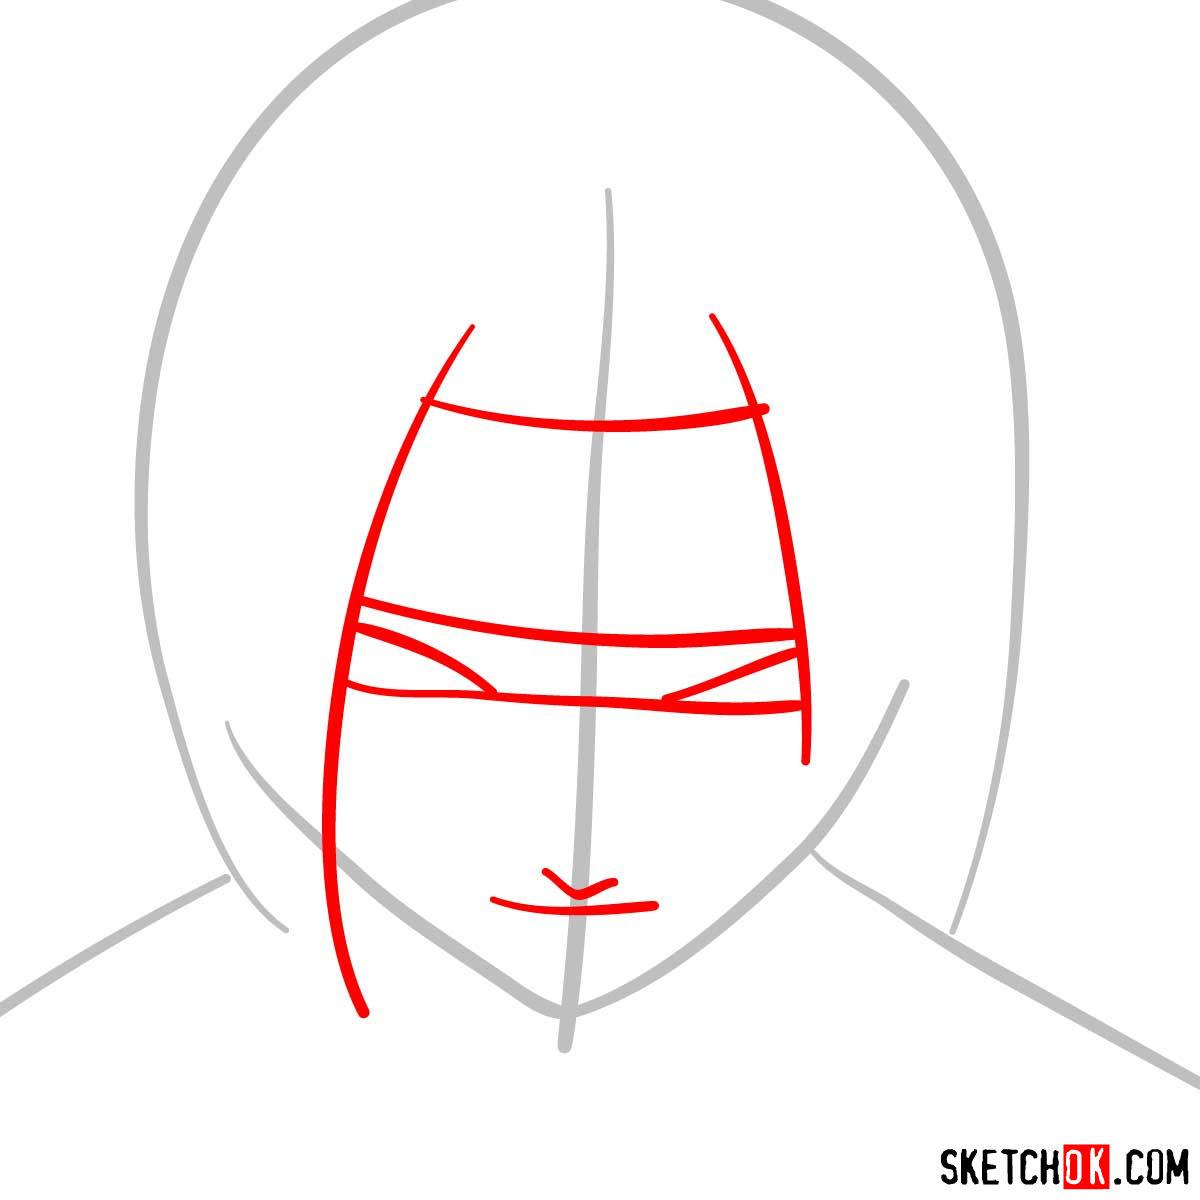 How to draw Sasuke's face (Naruto anime) - step 02